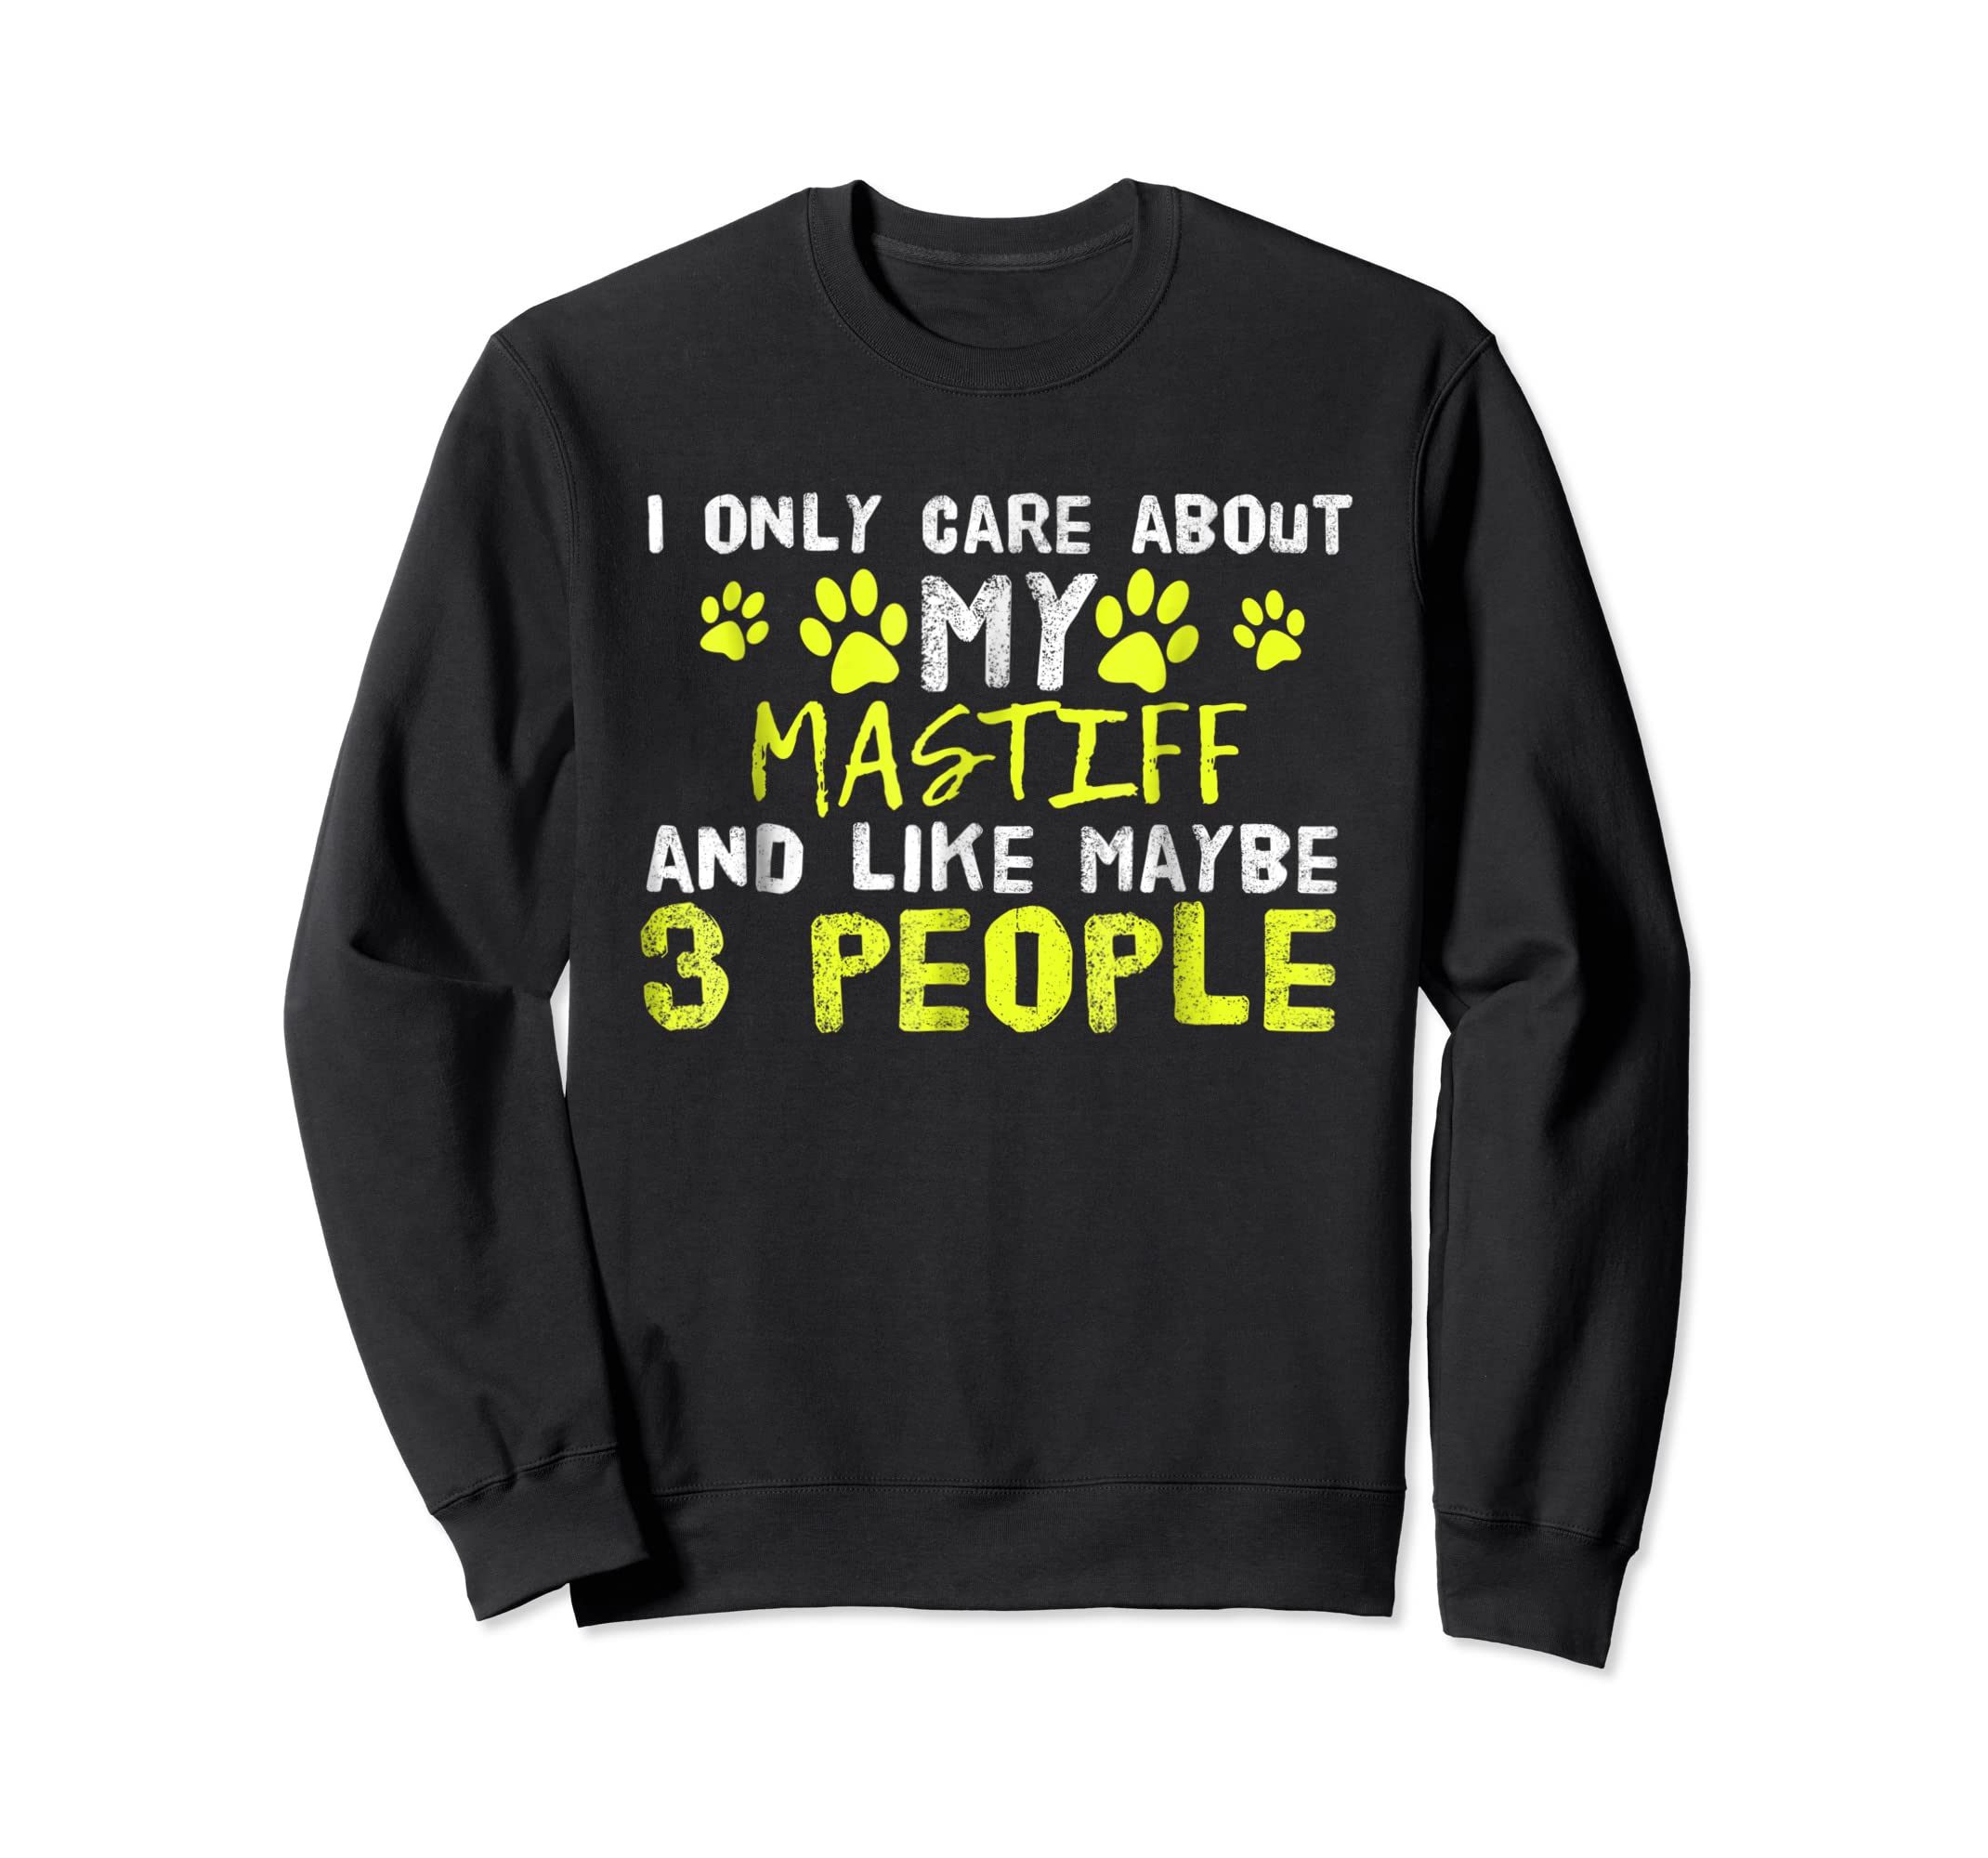 Mastiff Dog Shirt Introvert Love My Dog Tee-Sweatshirt-Black